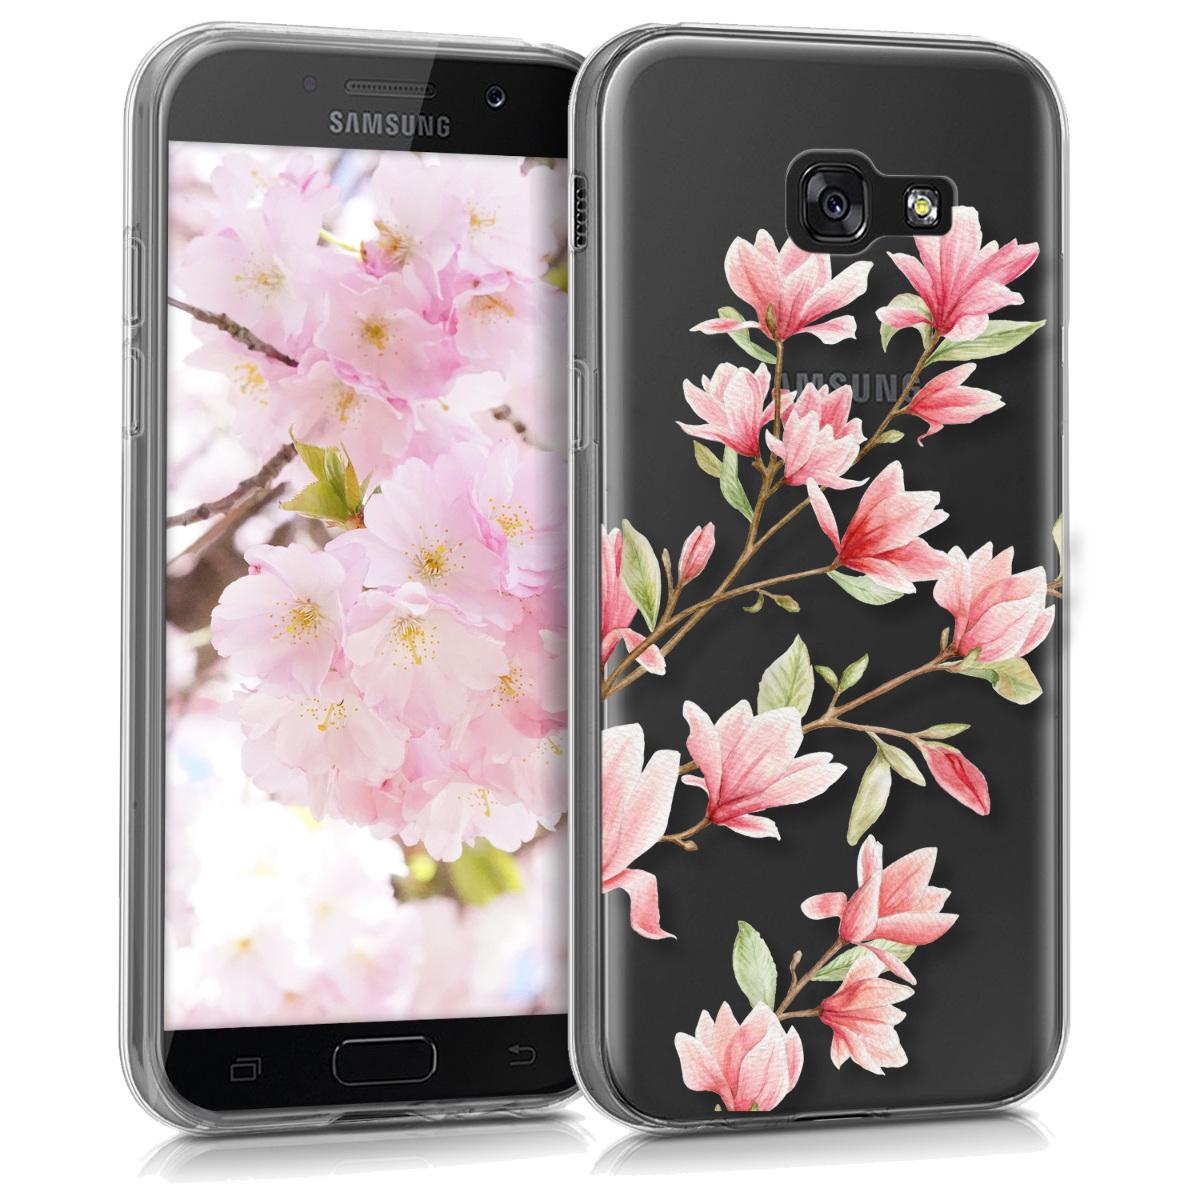 KW Θήκη Σιλικόνης Samsung Galaxy A5 (2017) - Διάφανη με σχέδιο λουλουδιών (41451.08)